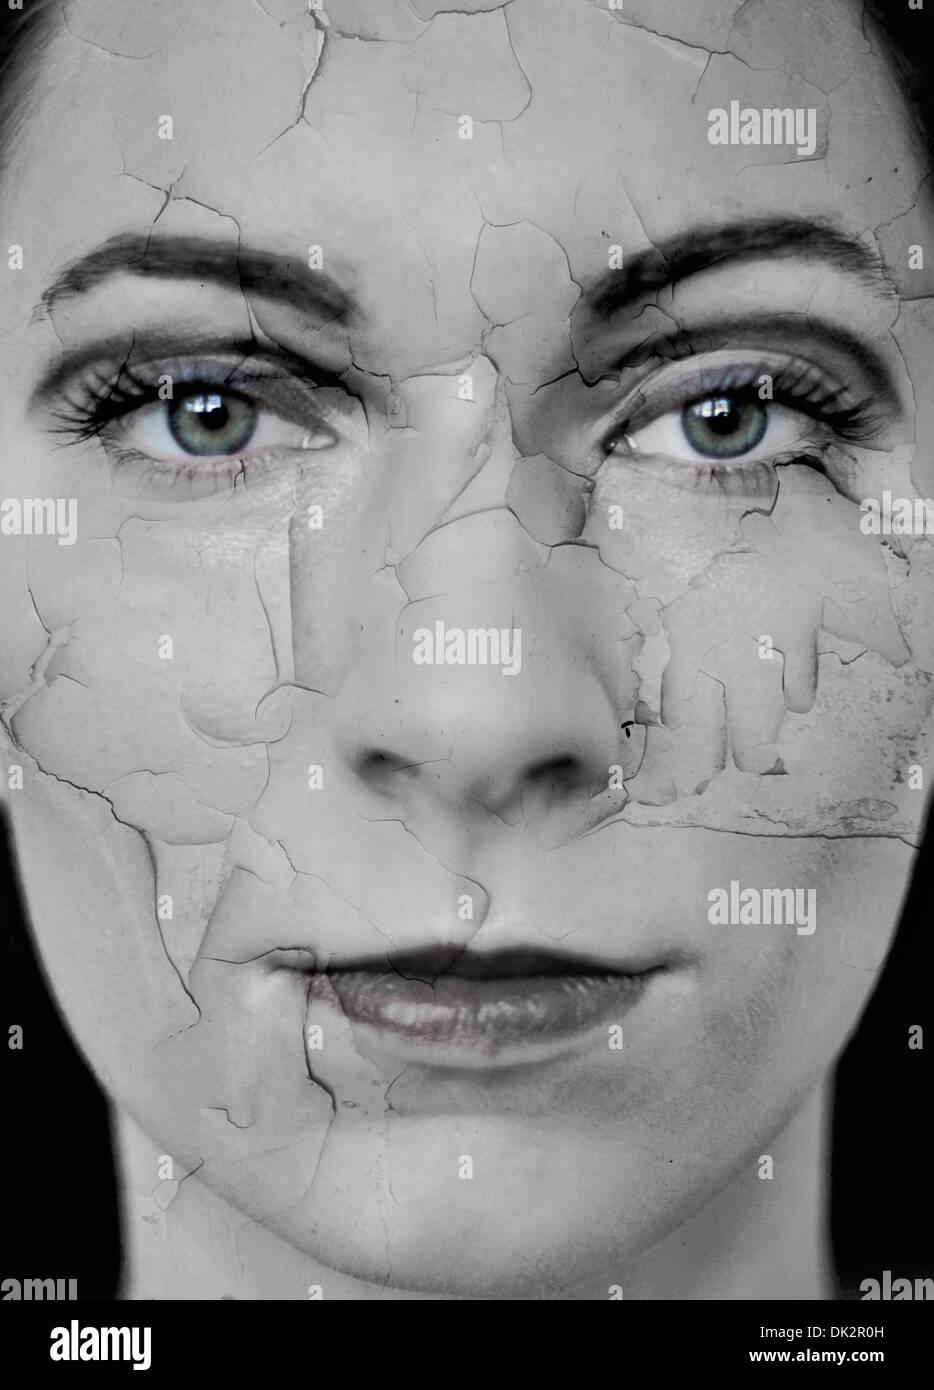 Frau mit trockene rissige Haut, digital composite Stockbild